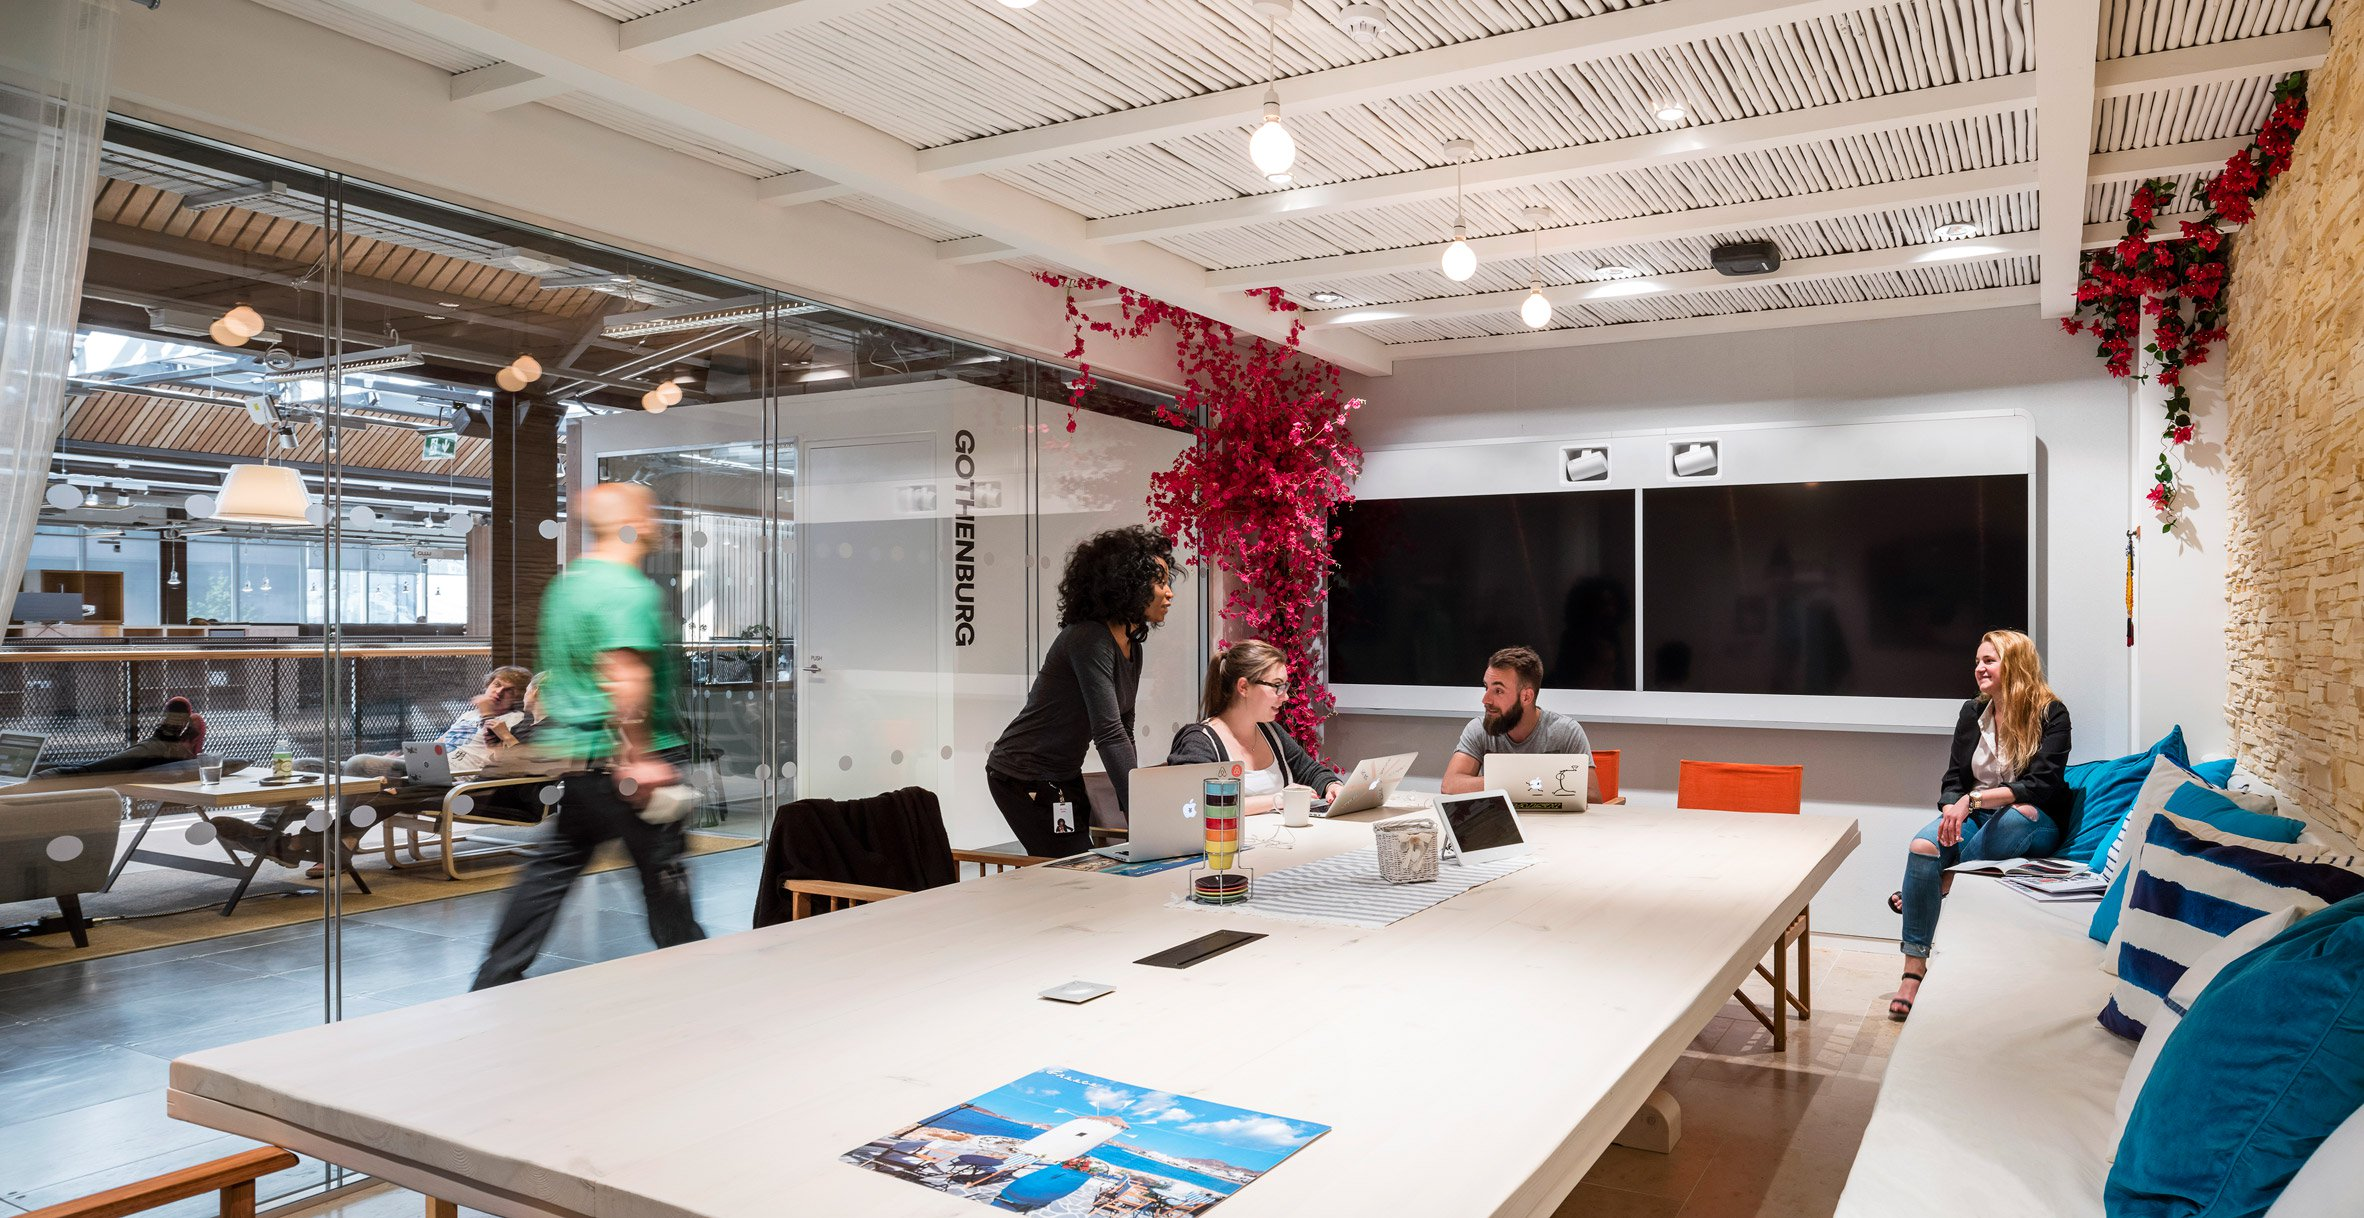 airbnb-dublin-office-interiors-ireland-offices_dezeen_2364_col_28